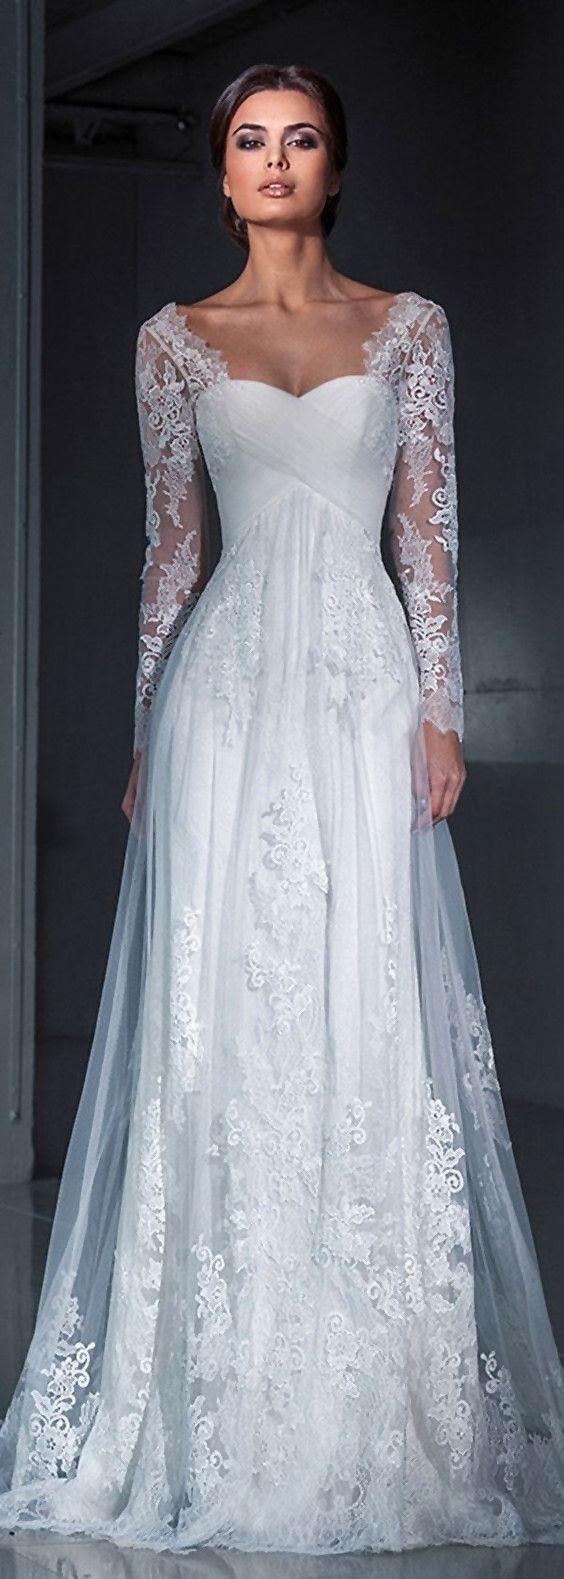 Stunning! | wedding dresses | Pinterest | Vestidos de novia, De ...